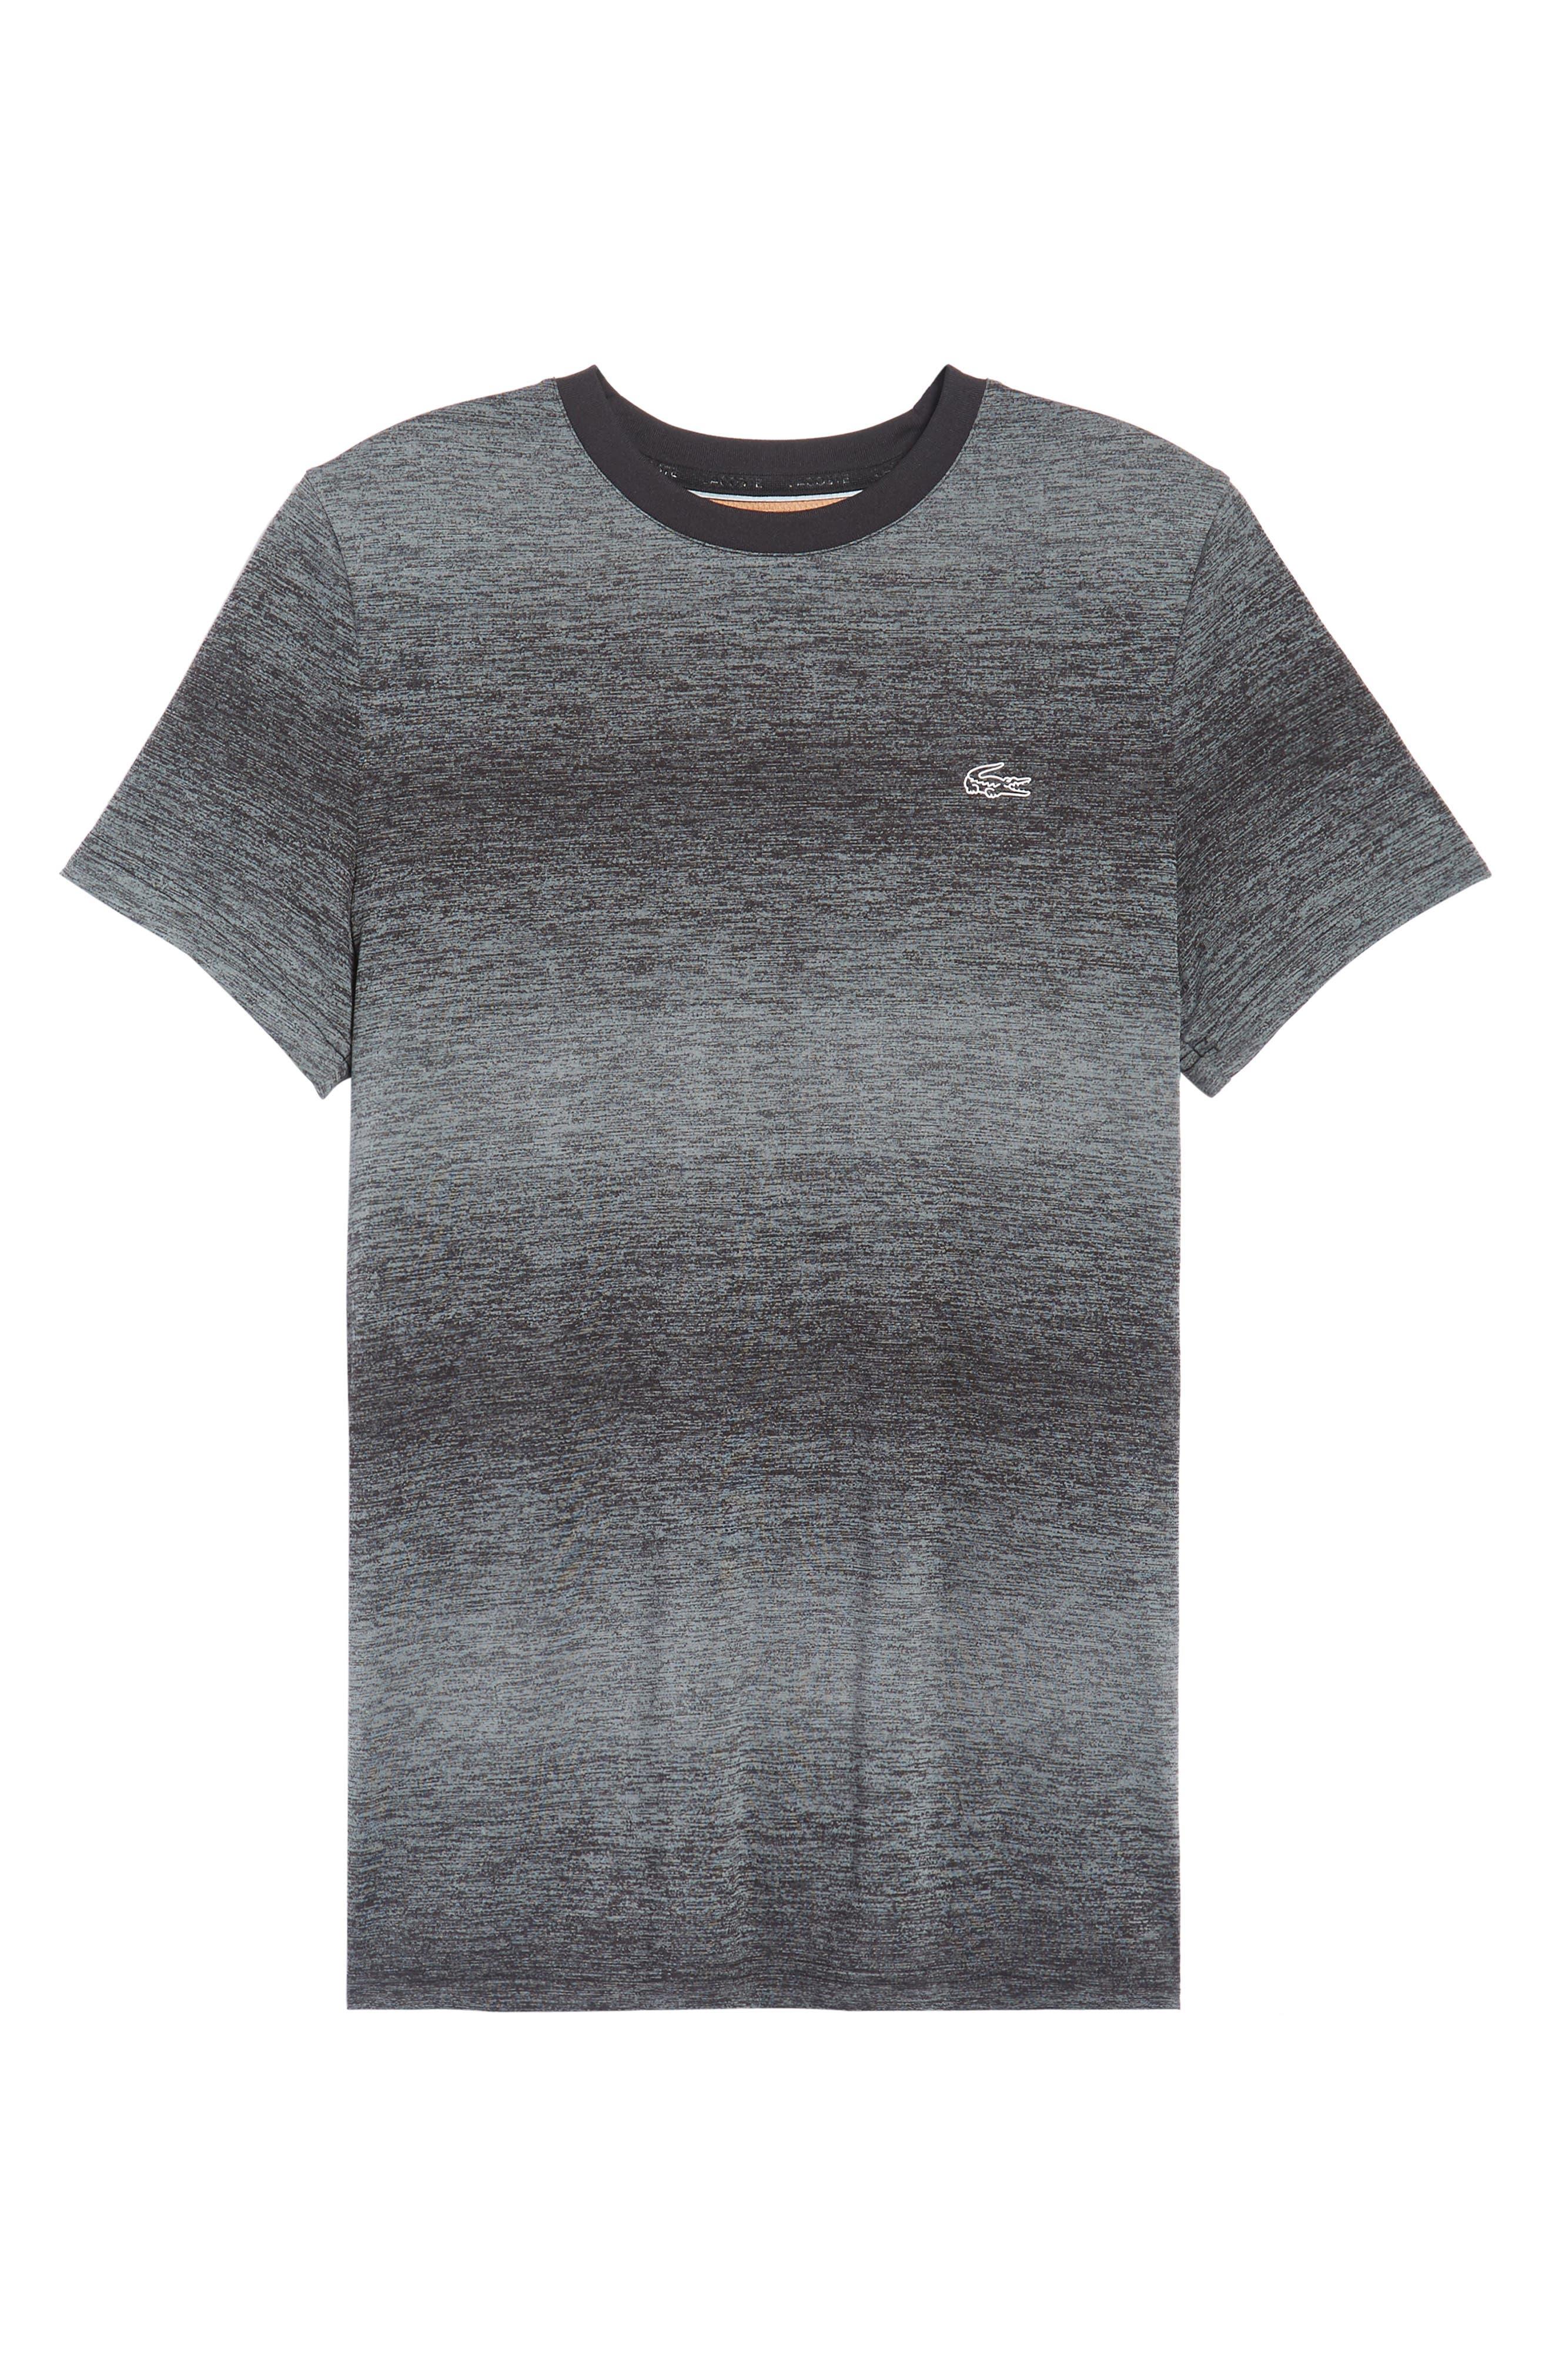 Ultra Dry Tech T-Shirt,                             Alternate thumbnail 6, color,                             007